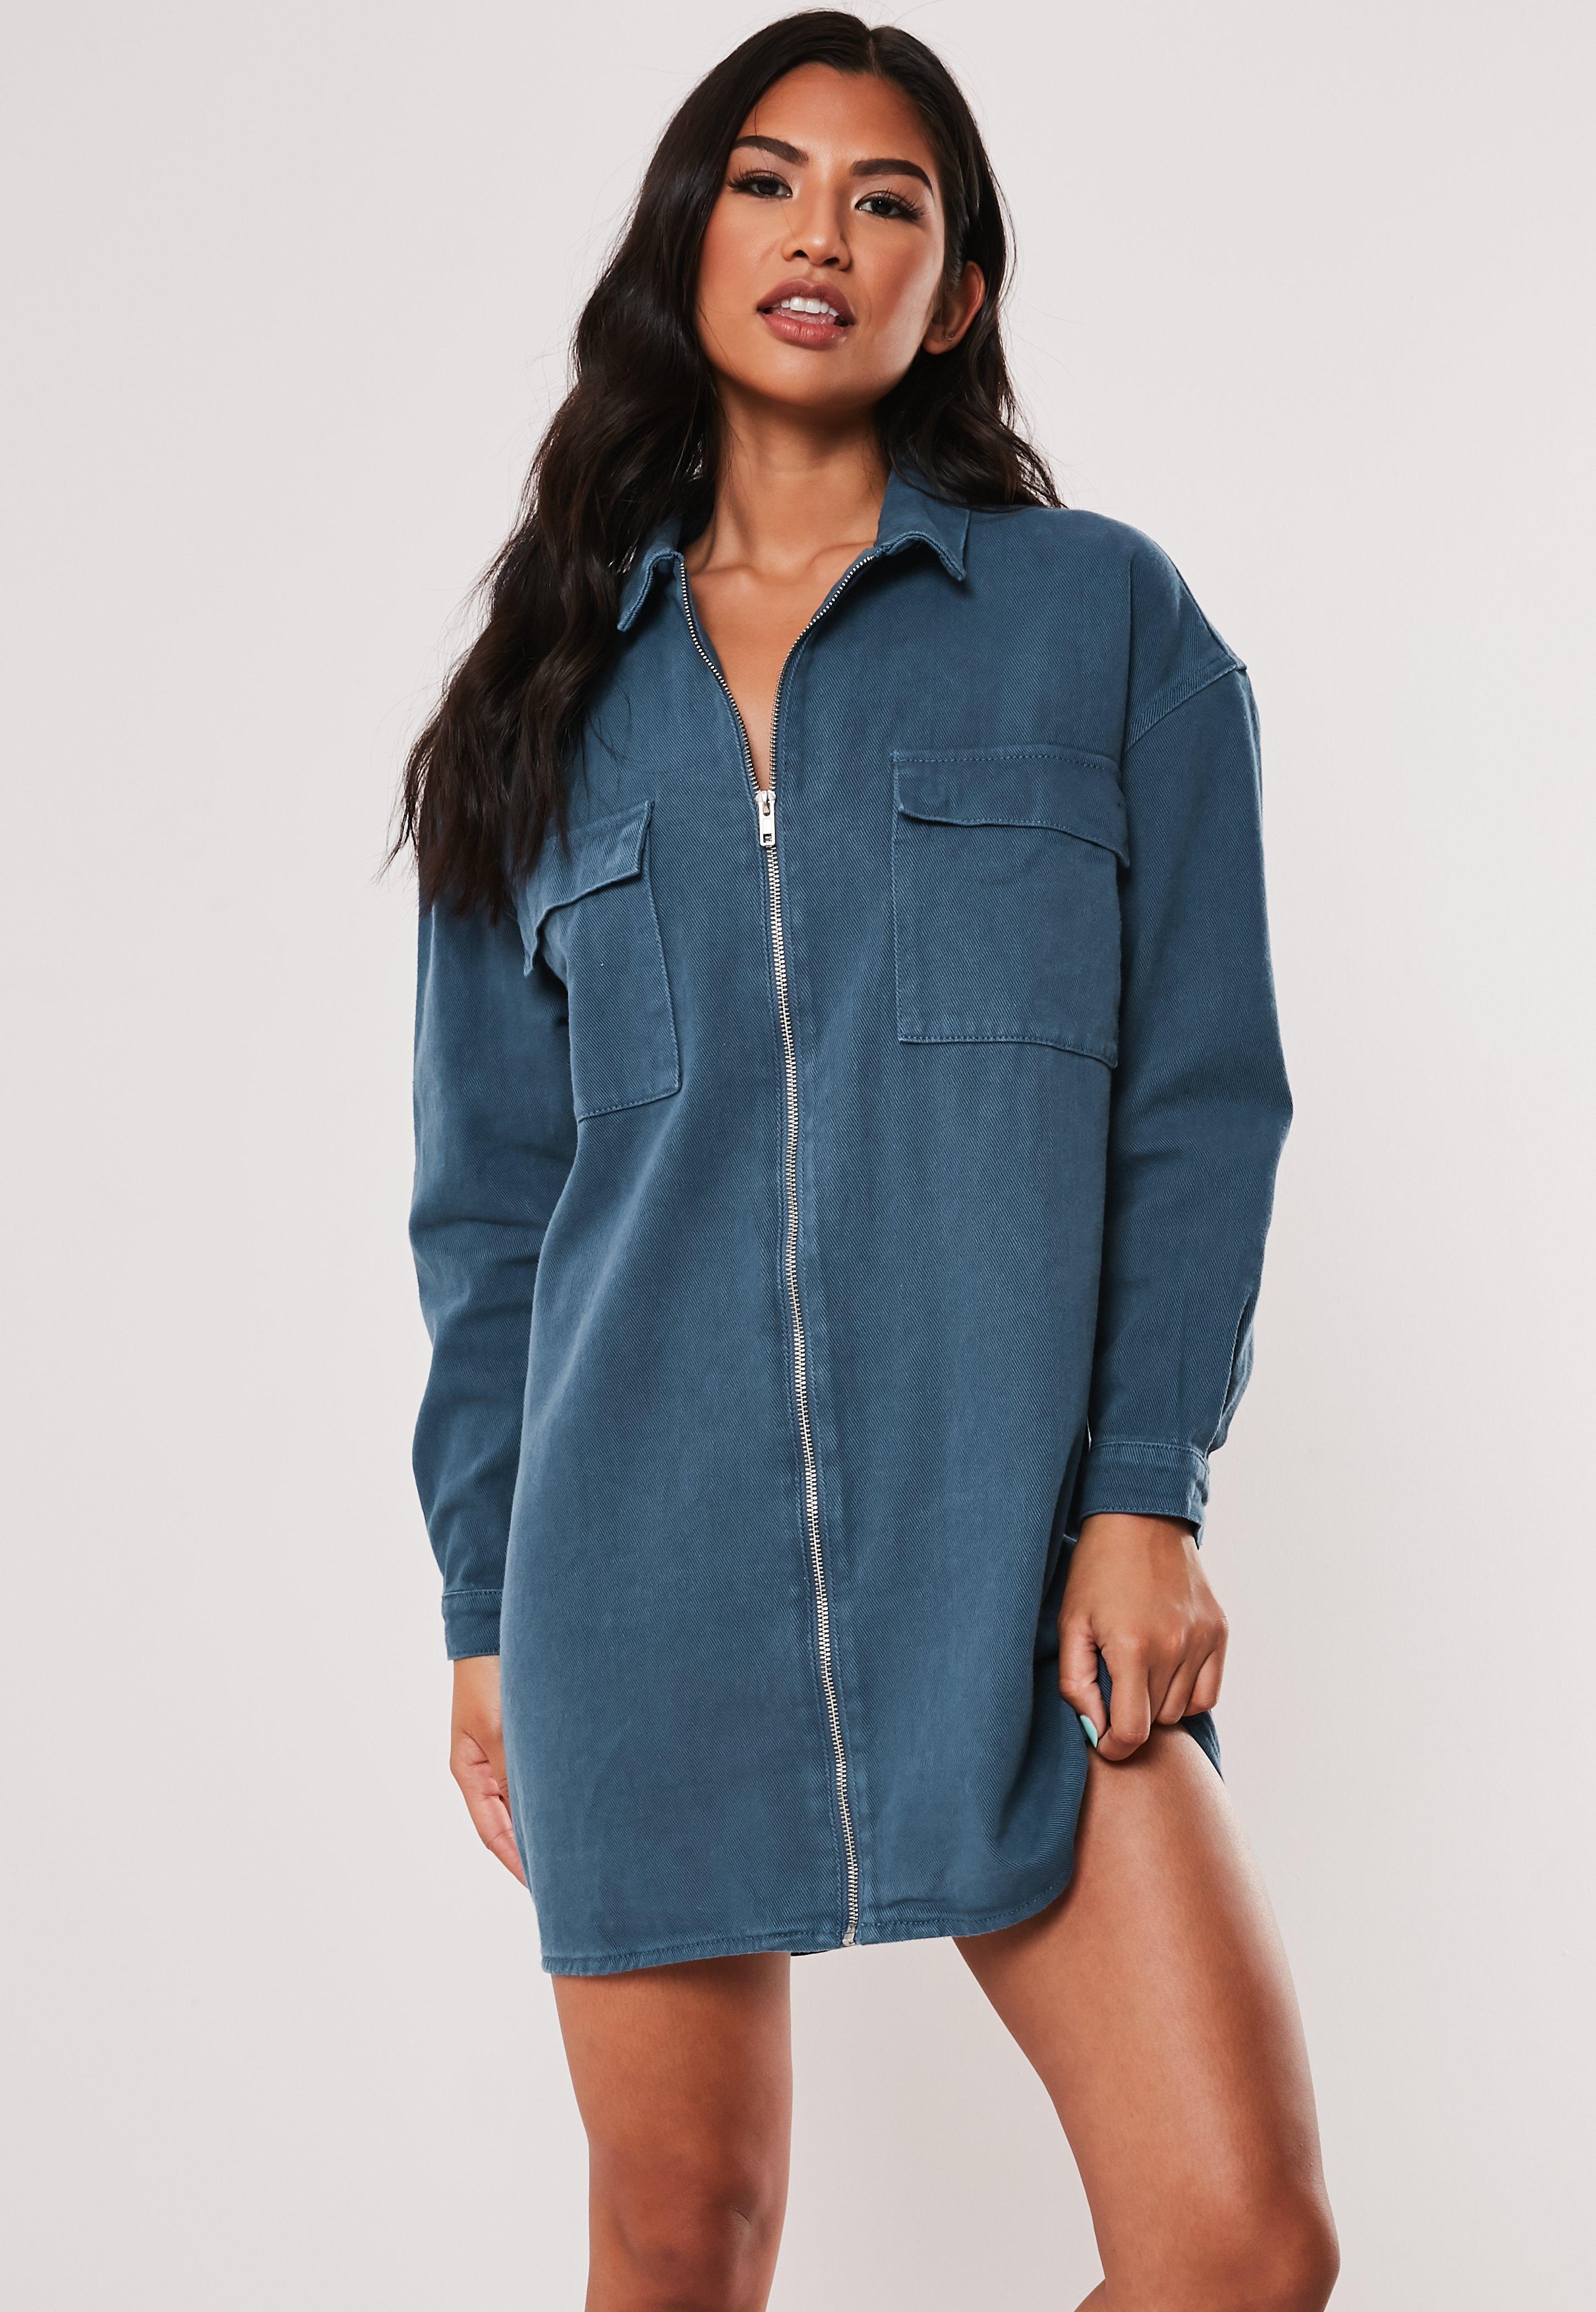 Denim Pocket Through Blue Zip Dress Utility 34R5qLAj